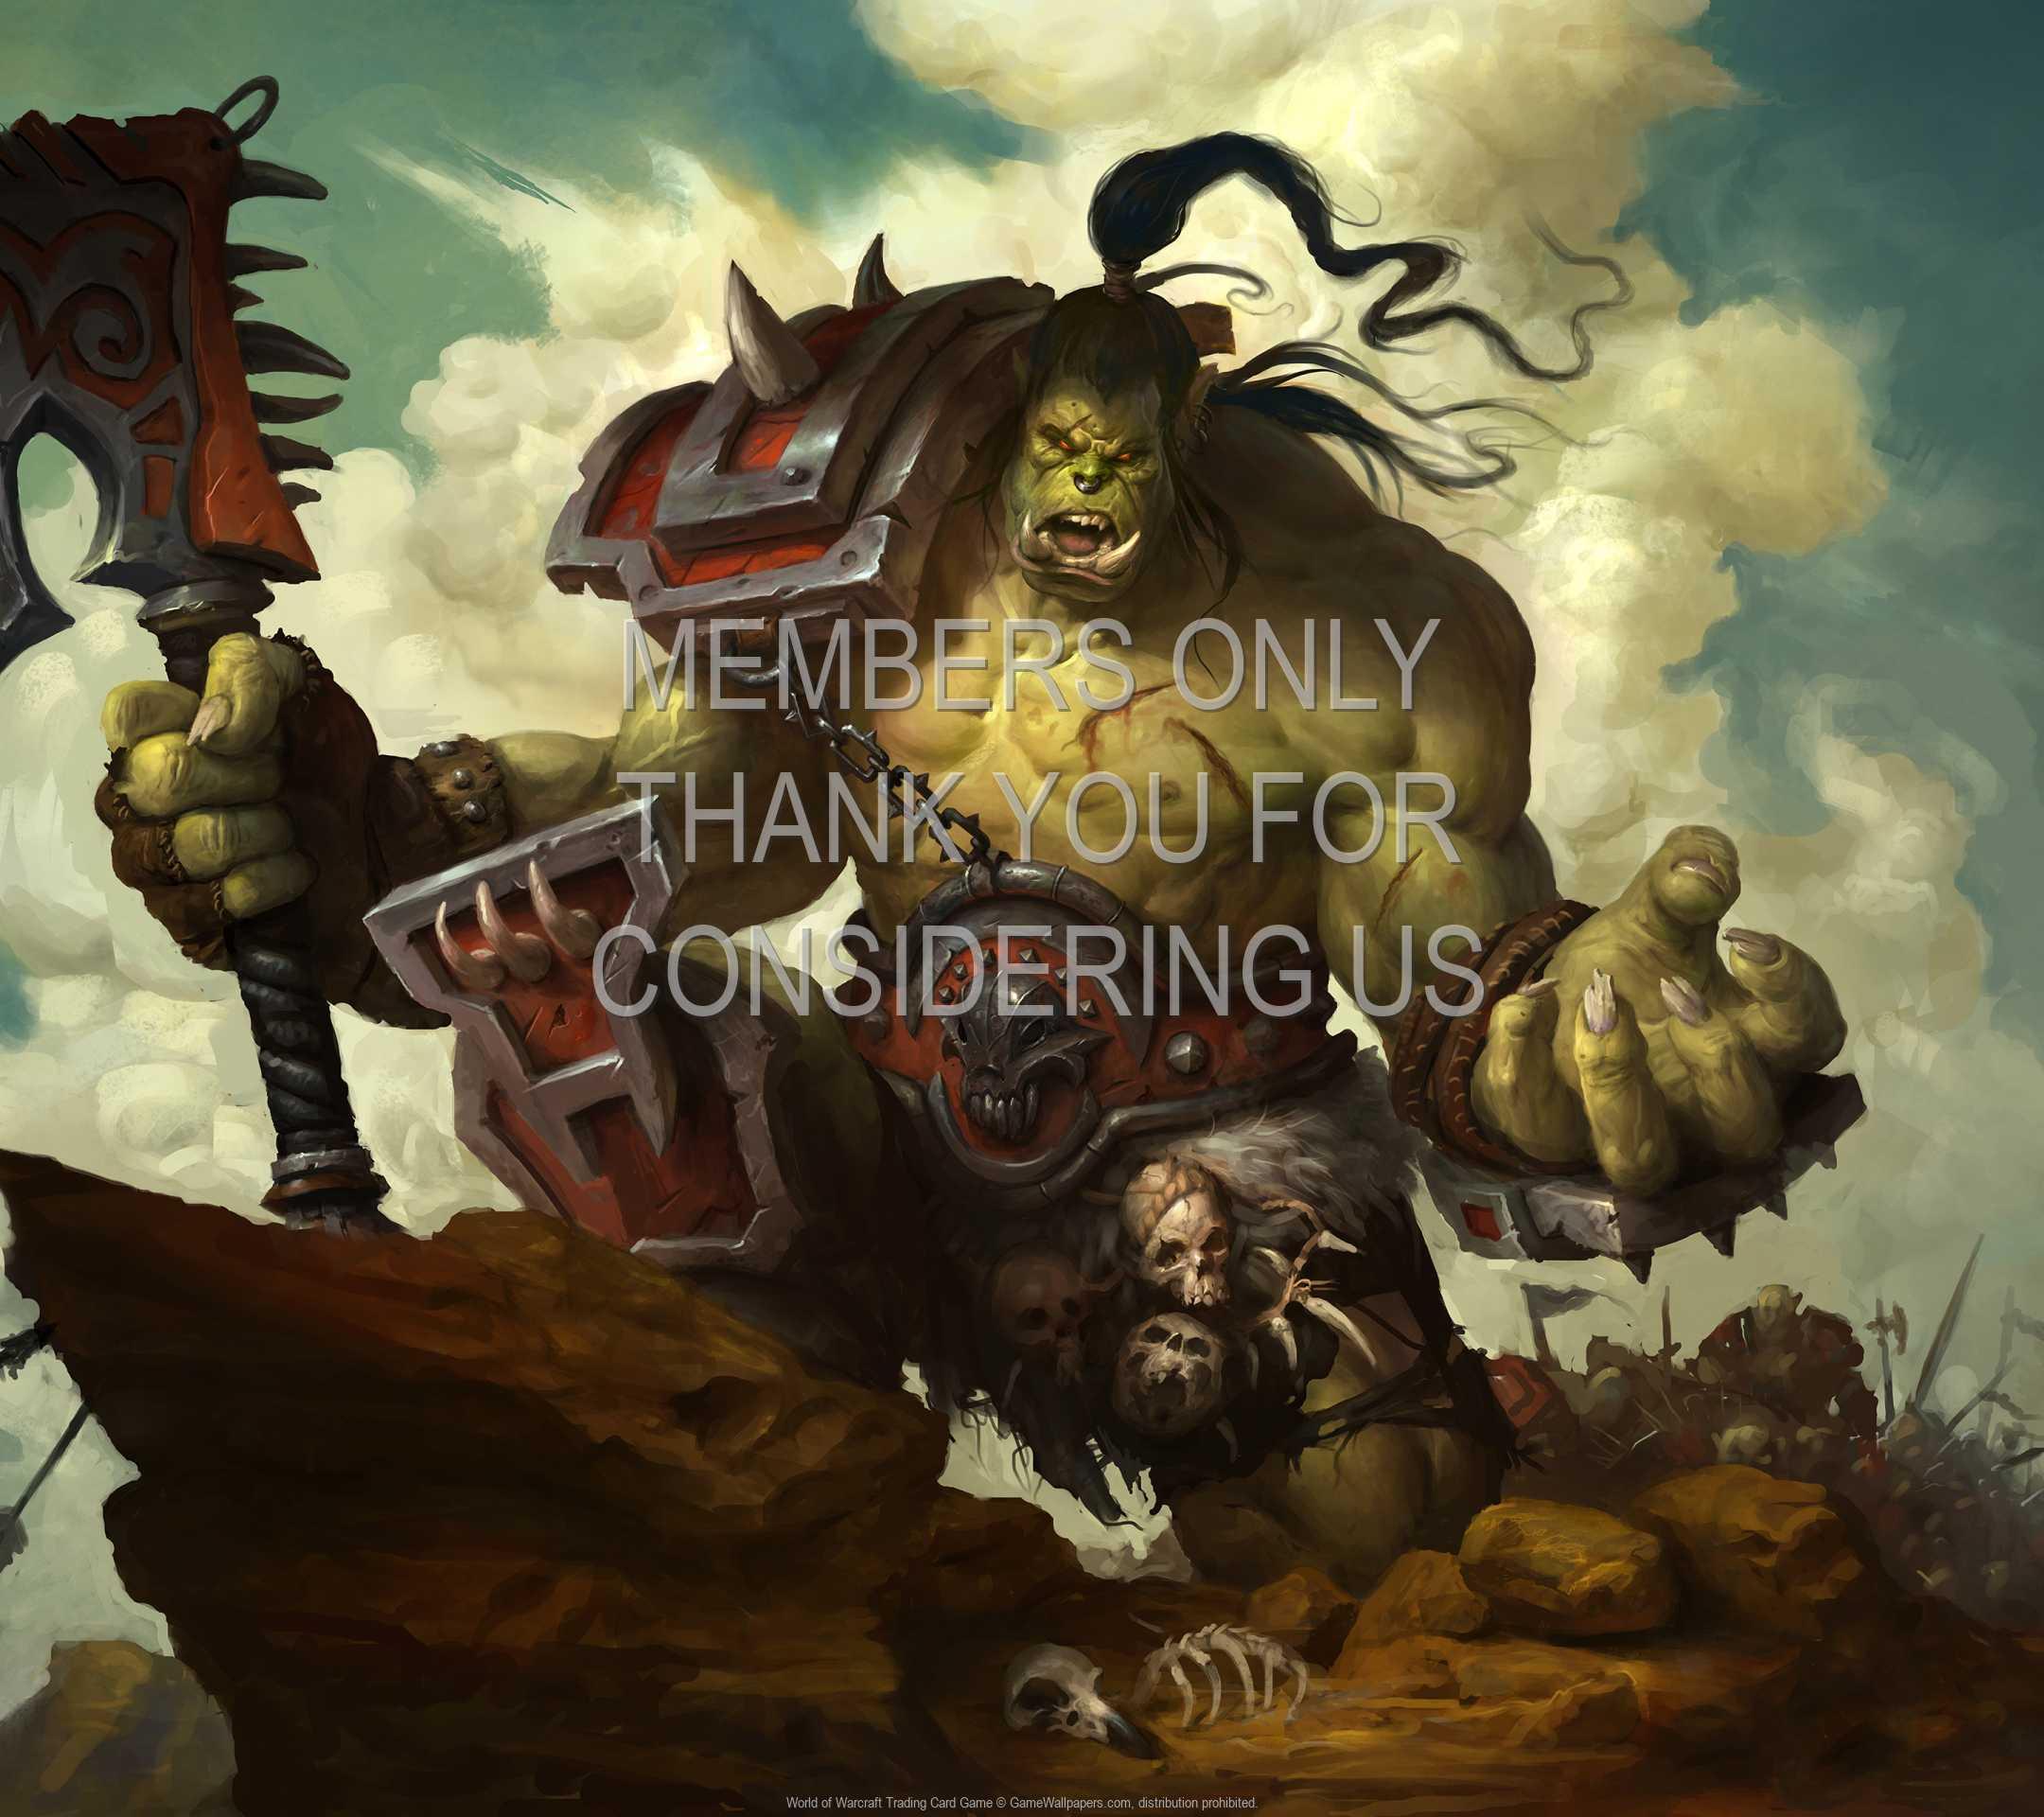 World of Warcraft: Trading Card Game 1080p Horizontal Móvil fondo de escritorio 60